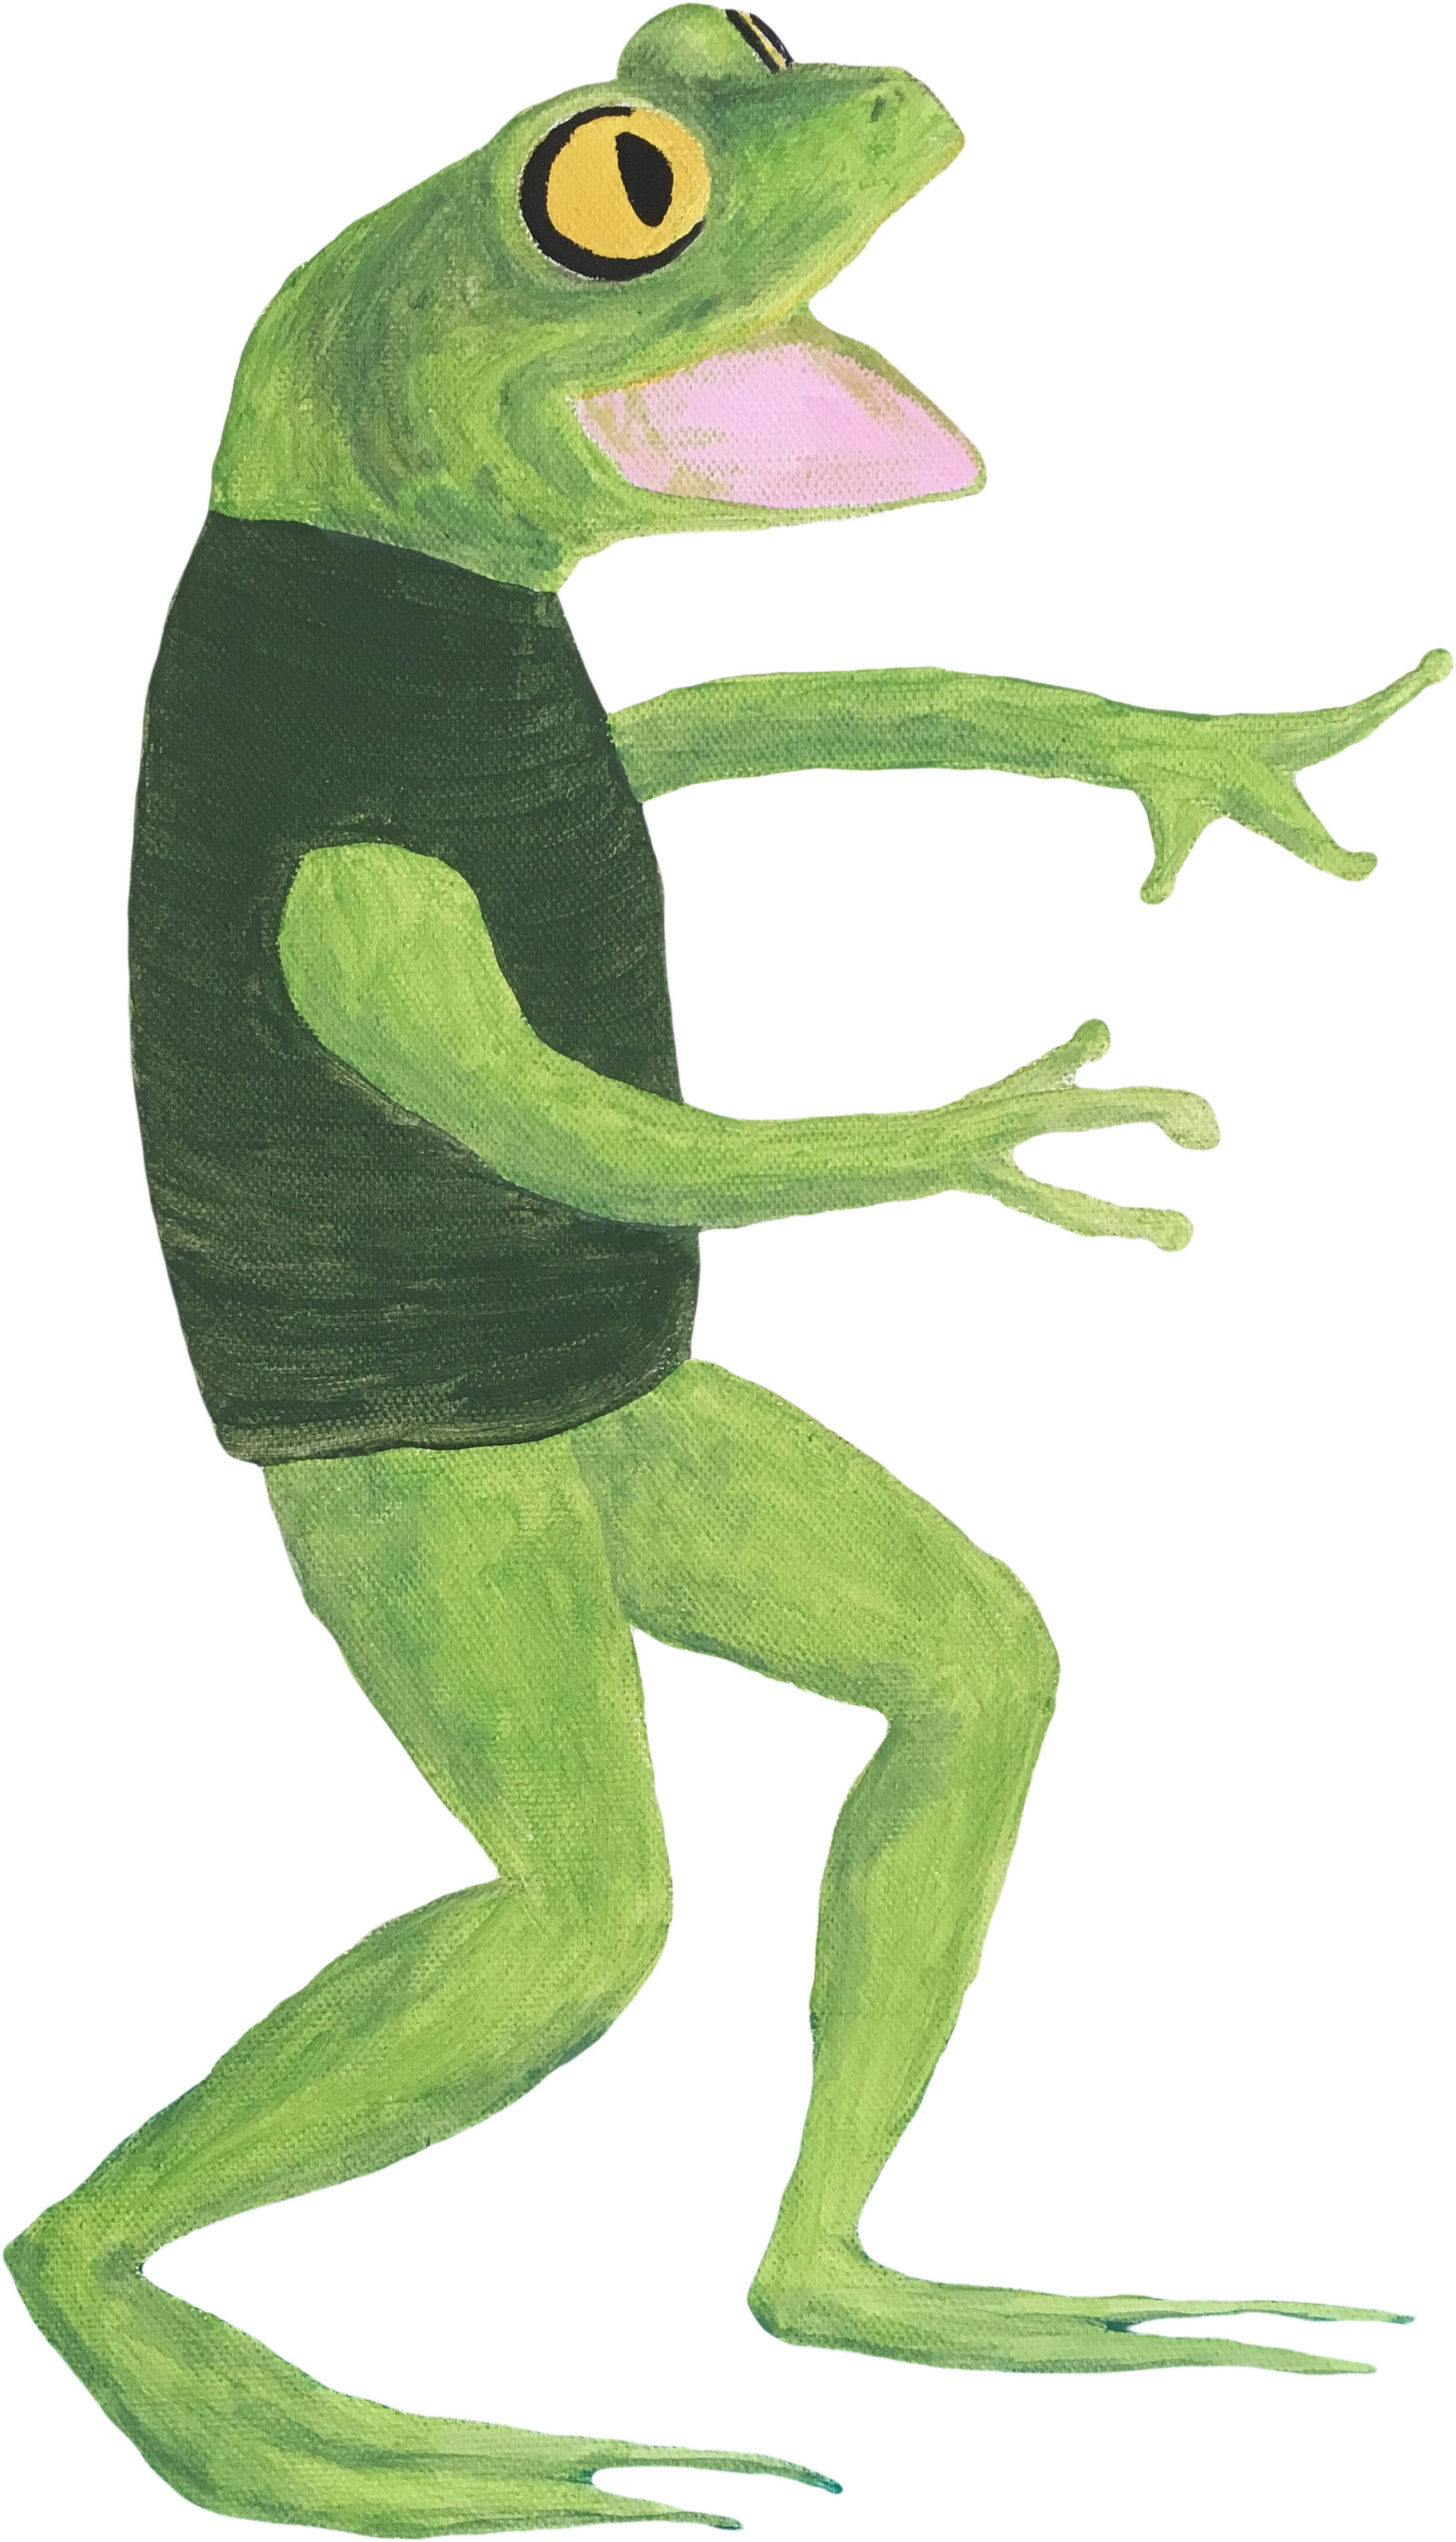 cutout_Frog_web.jpg